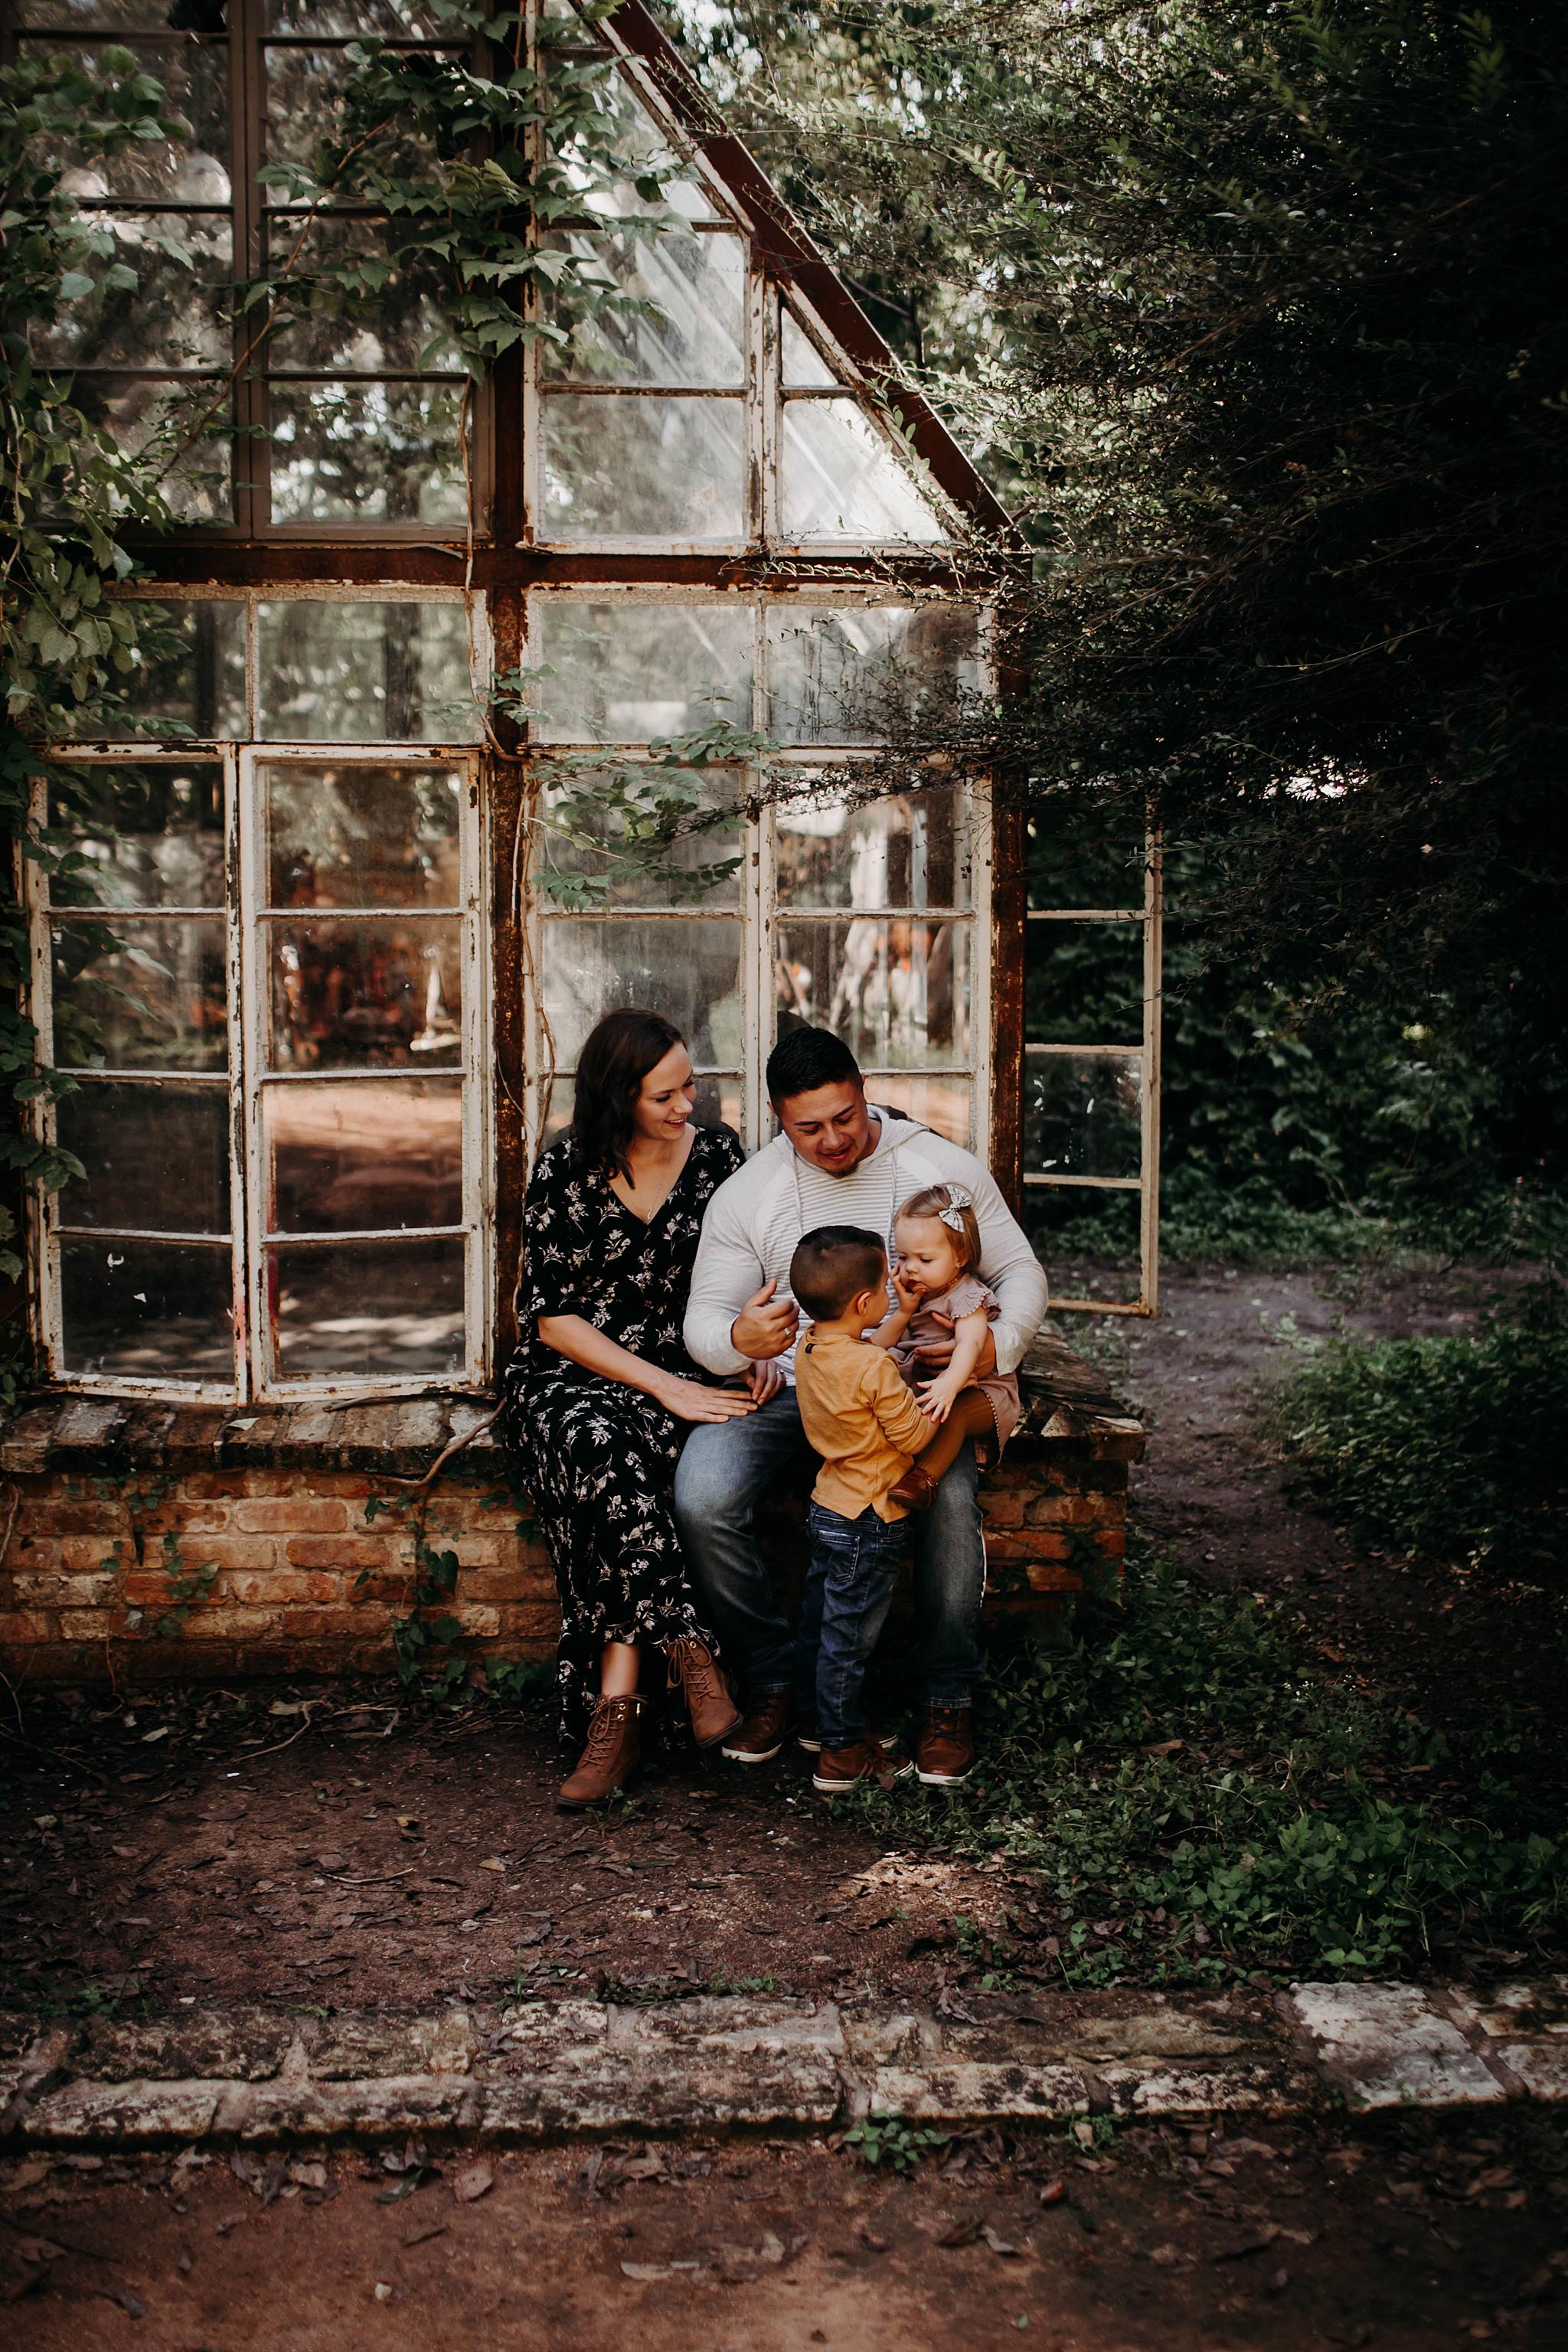 Luera-VMP-San-Antonio-Family-Photography-11_WEB.jpg